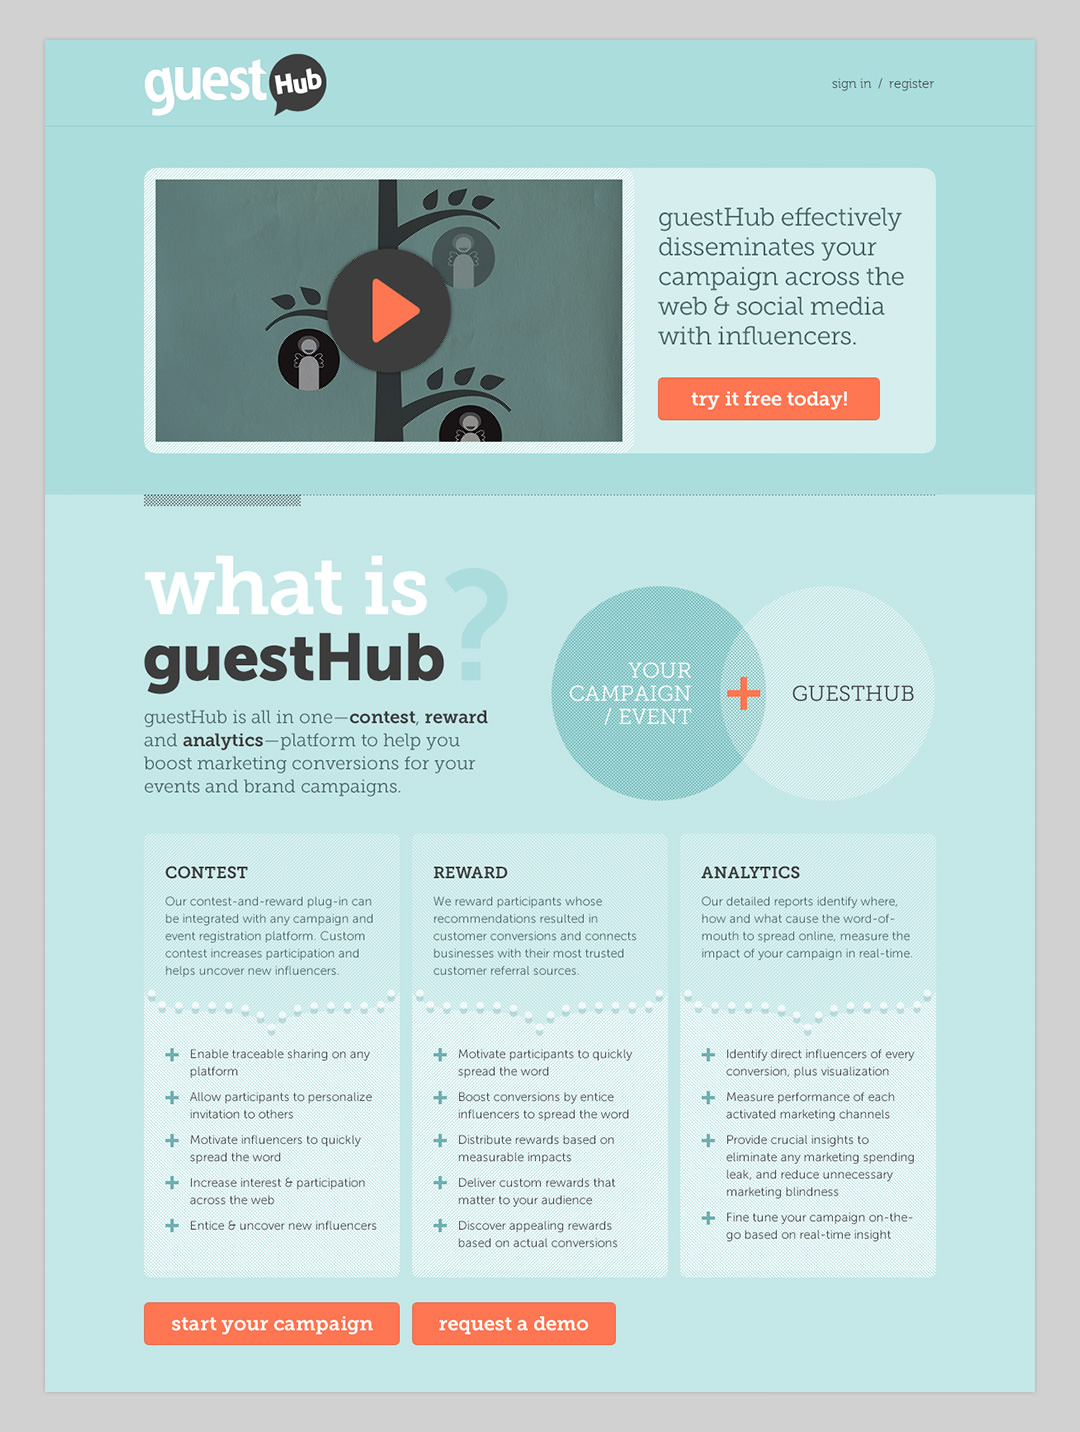 GuestHub